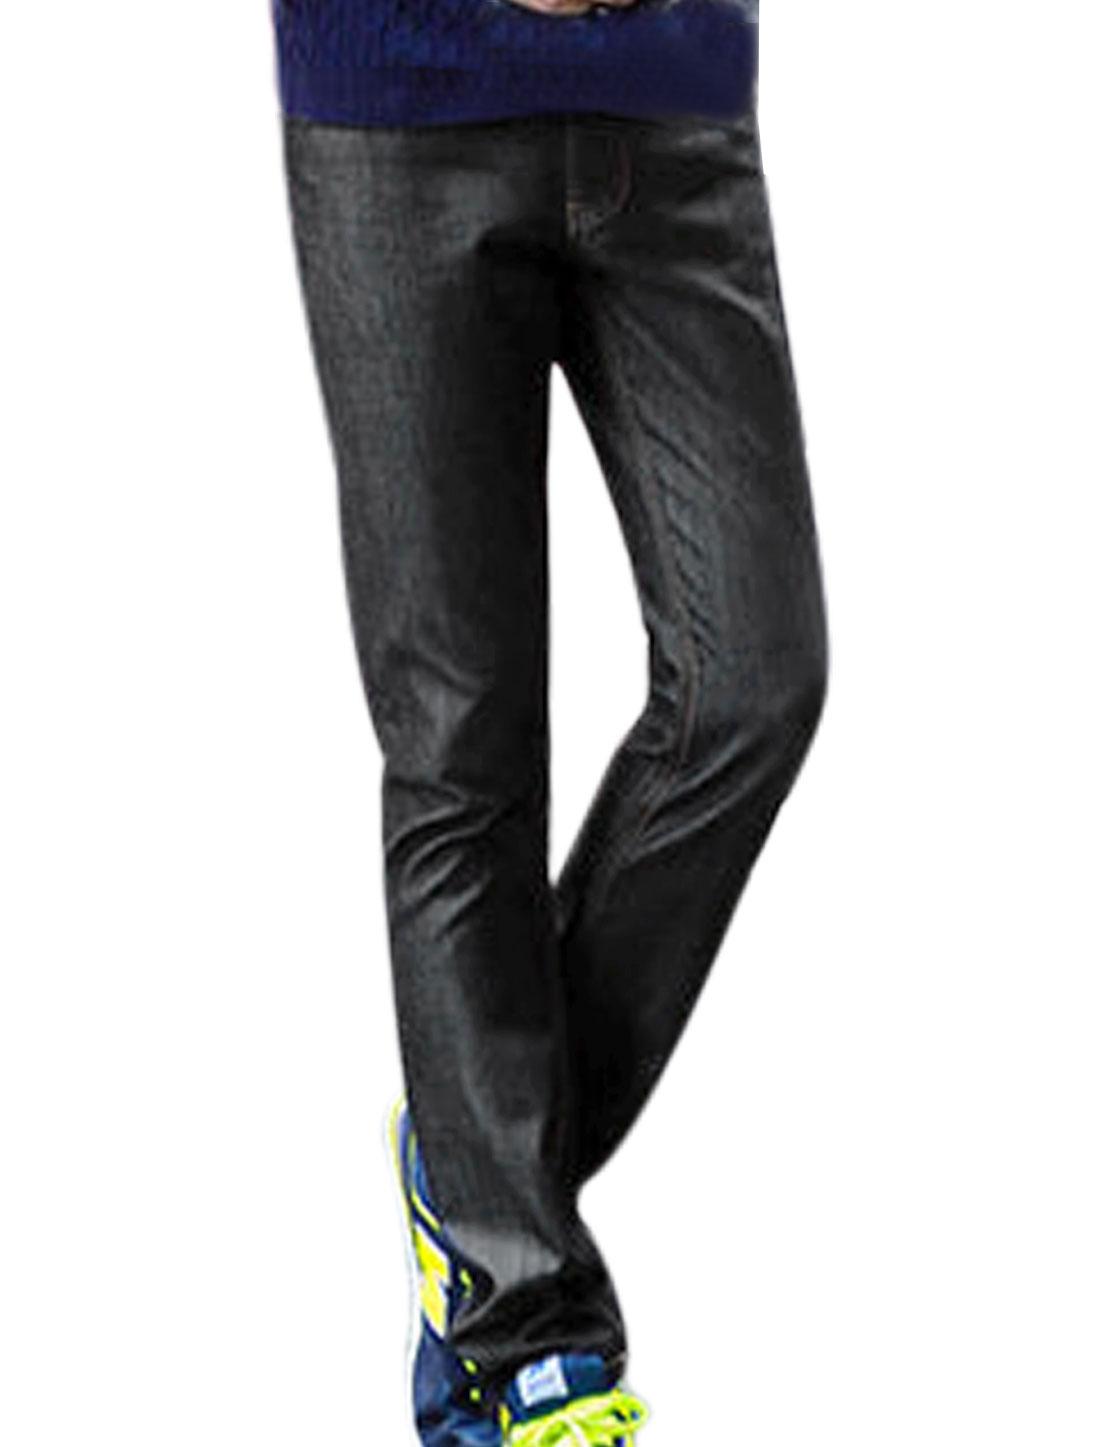 Men Black Mid Waist Belt Loop Zip Up Hip Pockets Fleece Lined Casual Jeans W34